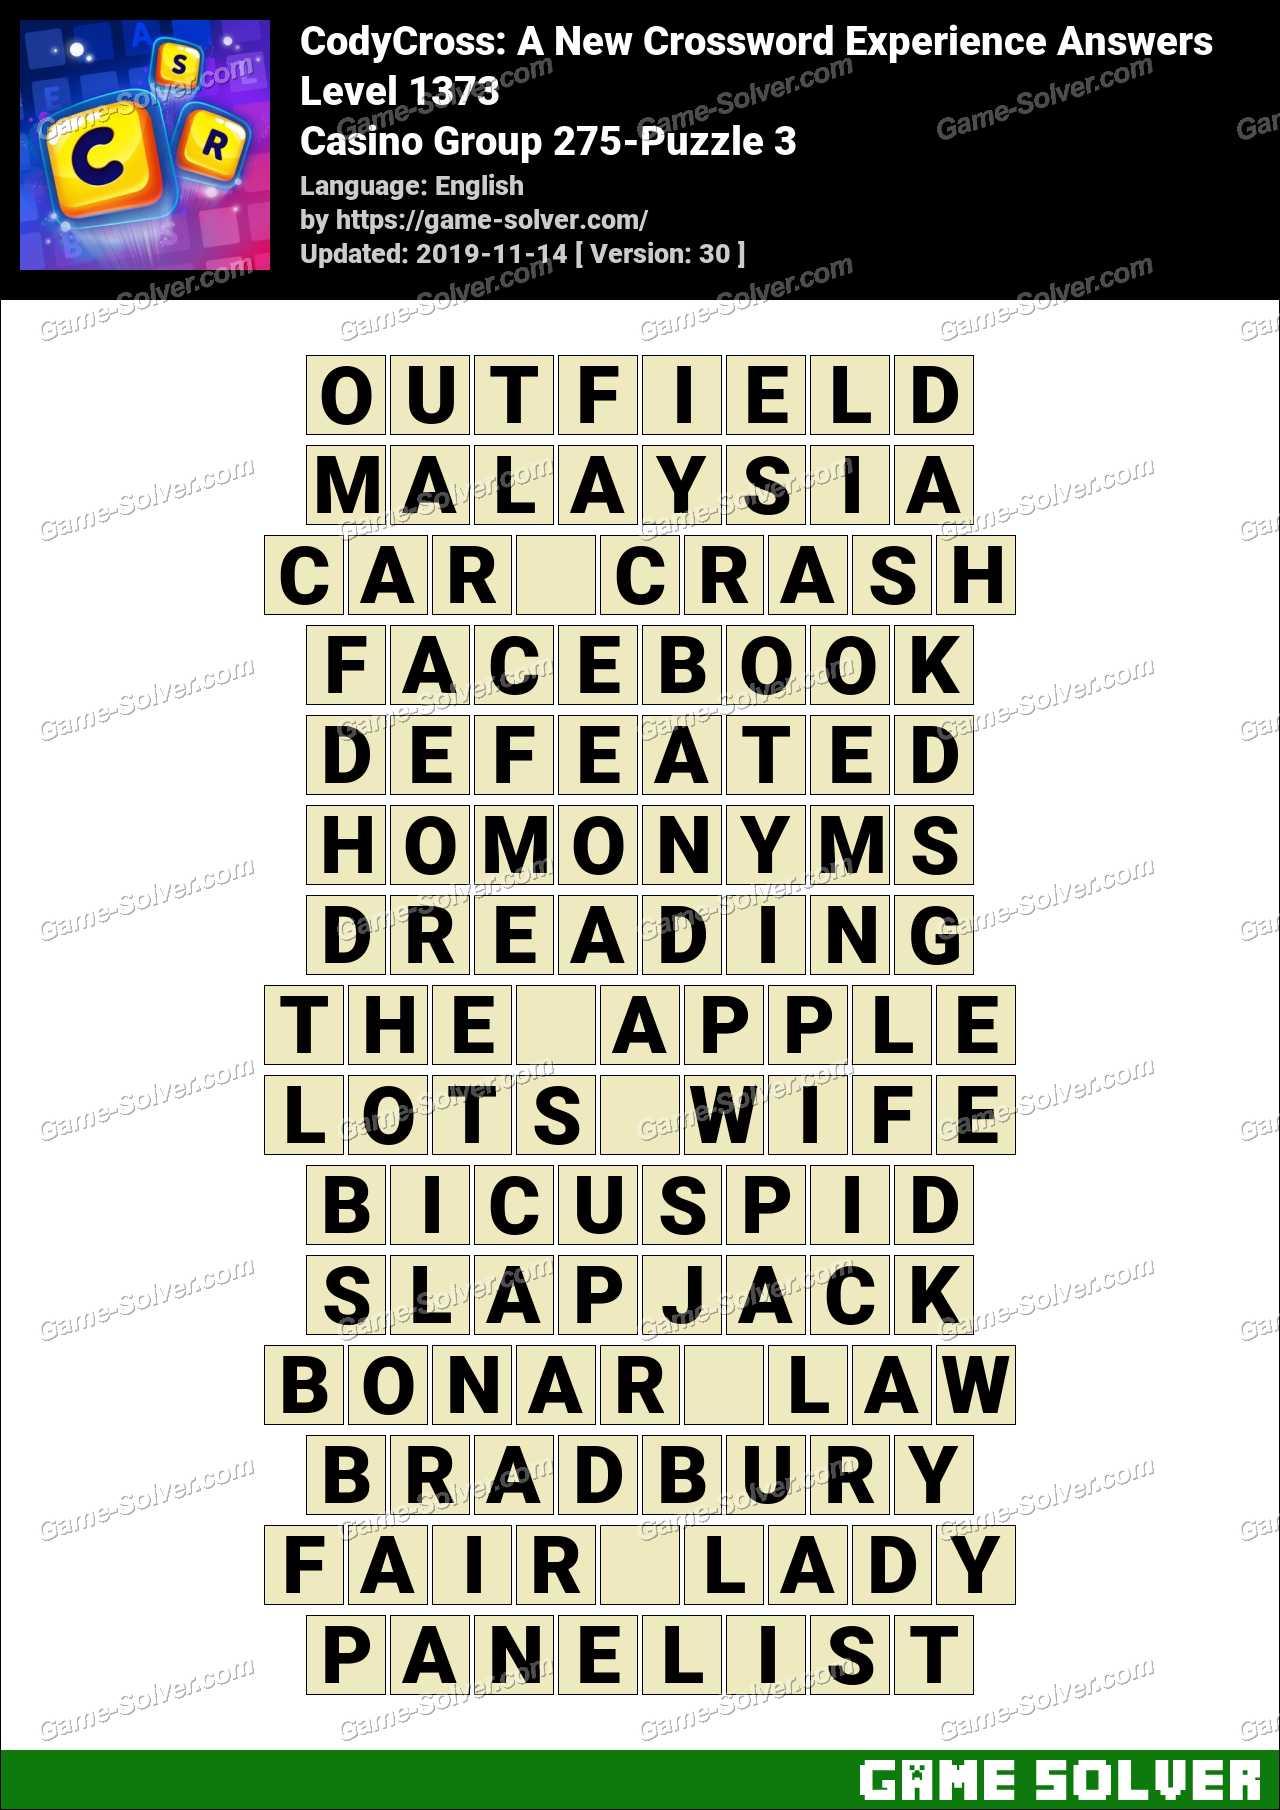 CodyCross Casino Group 275-Puzzle 3 Answers